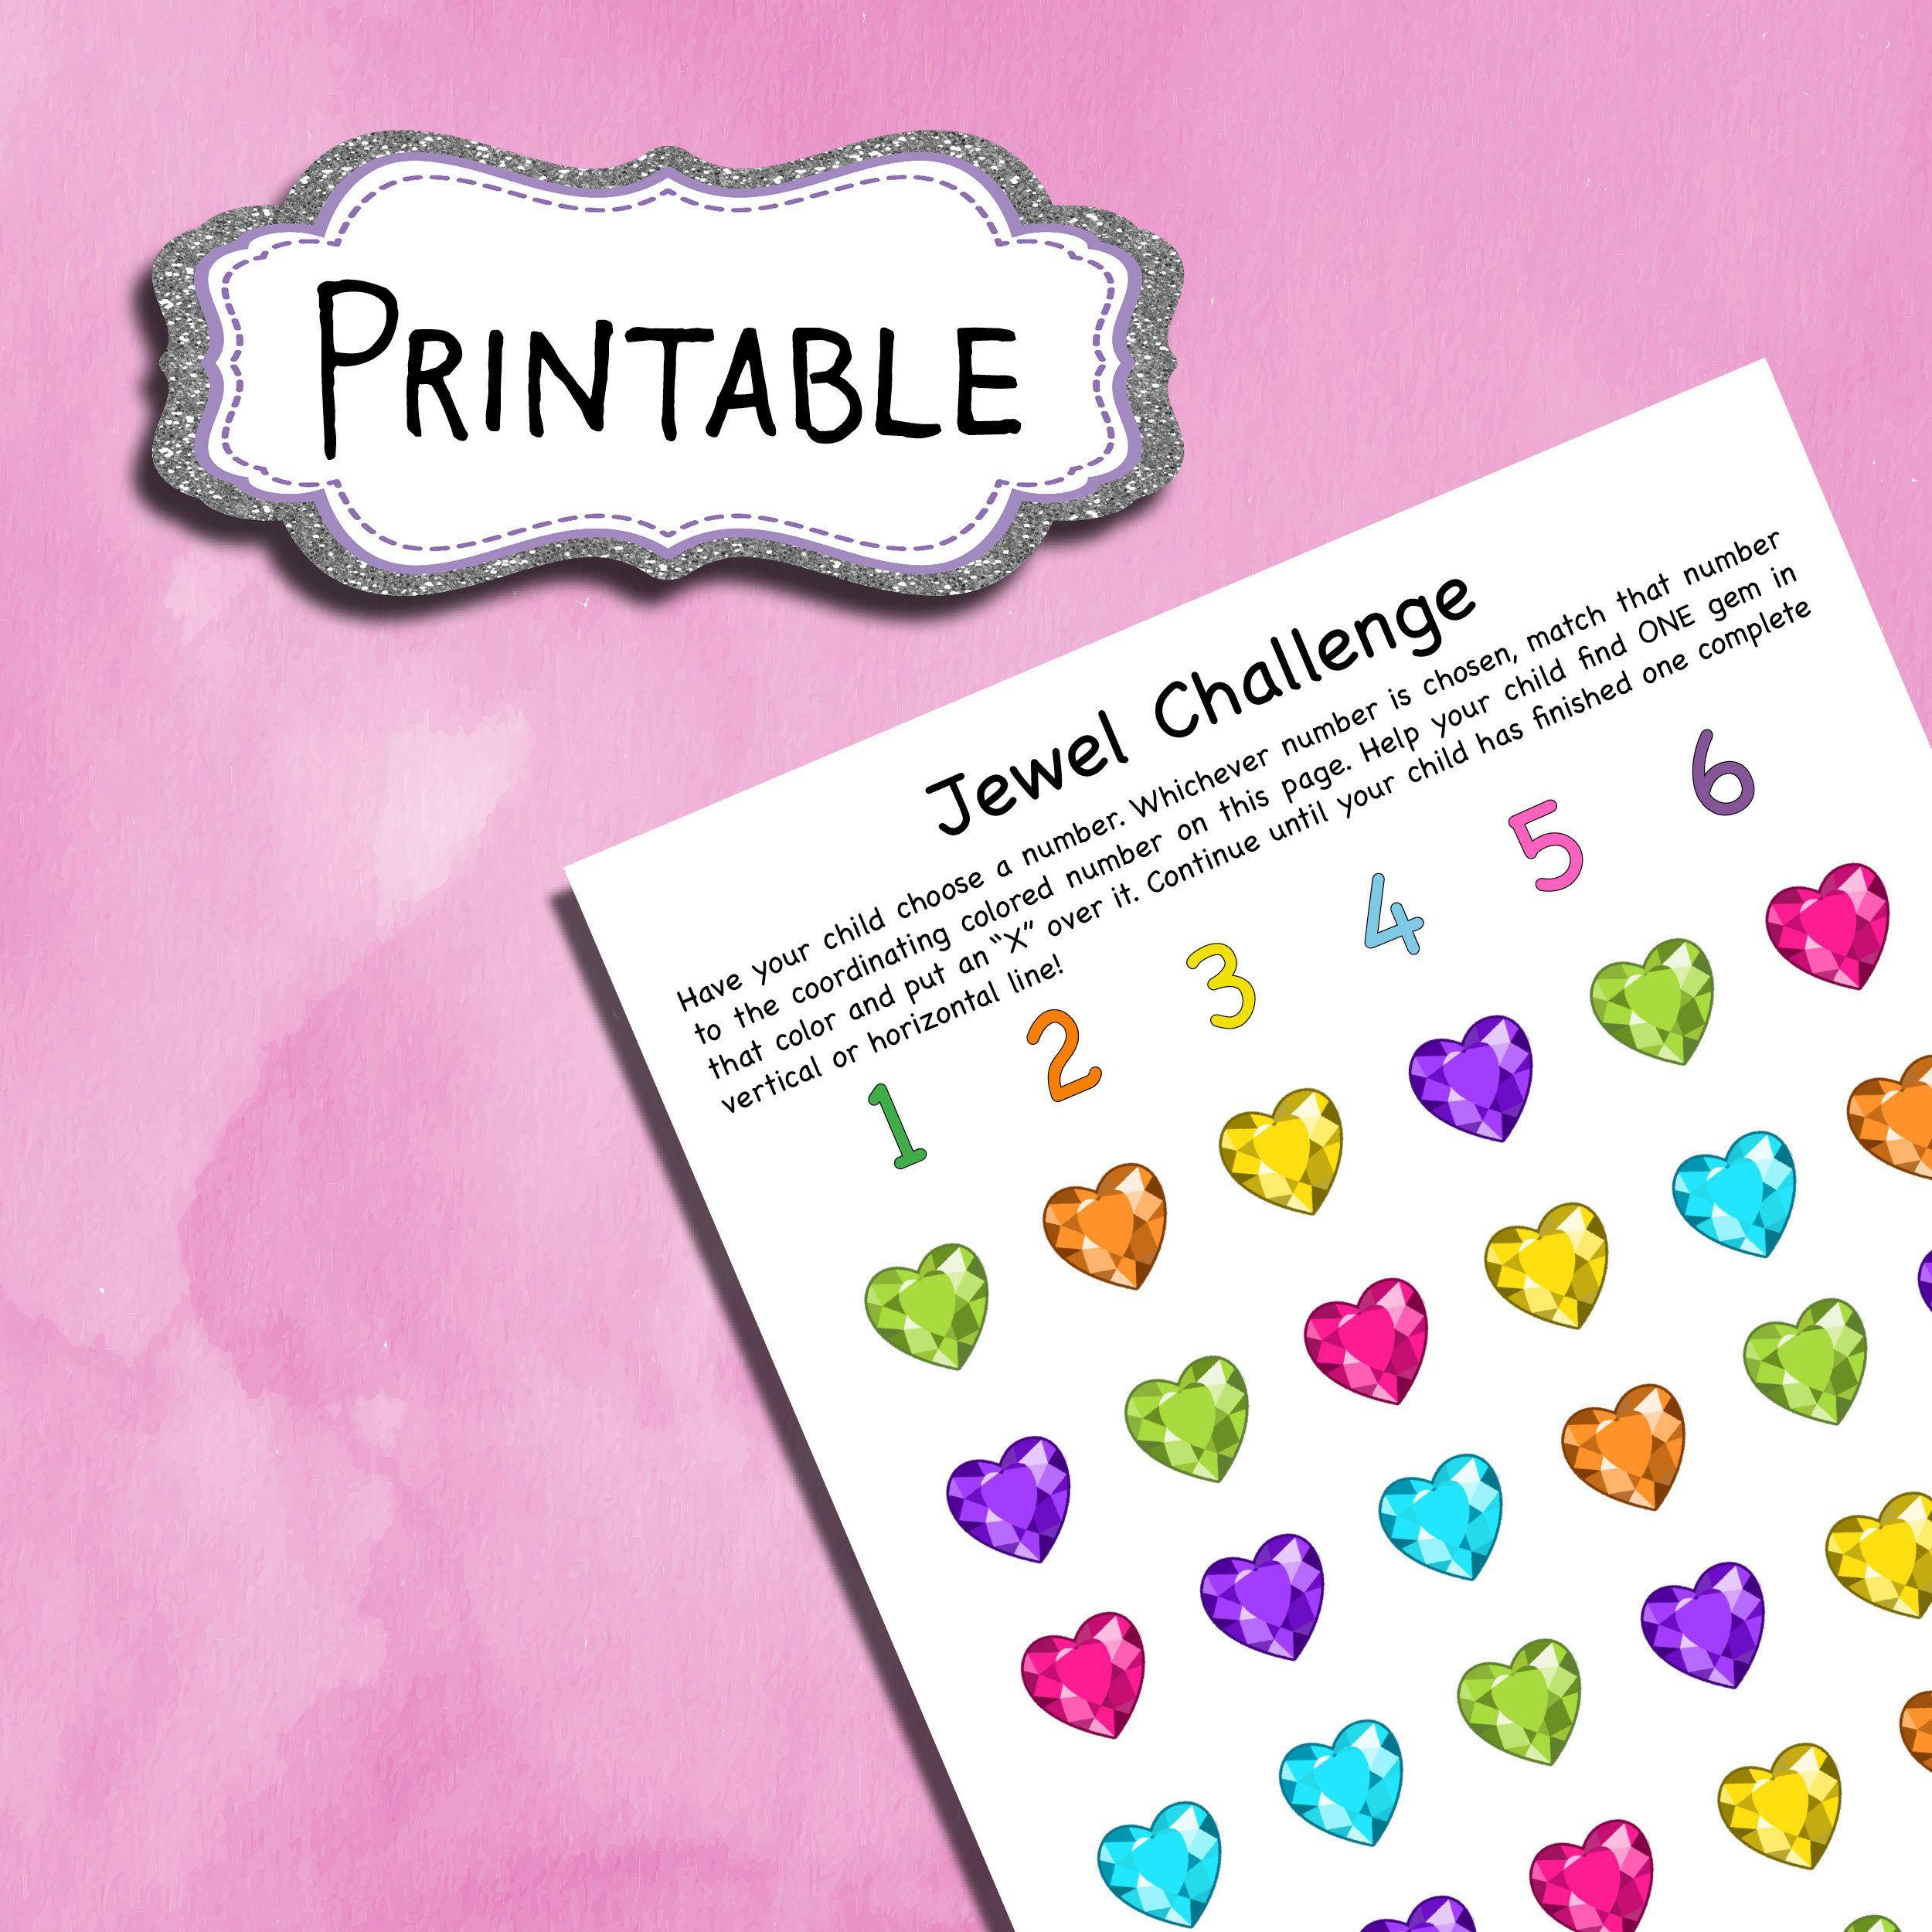 Jewel Challenge Printable Worksheet For Kids Princess Etsy Kids Worksheets Printables Worksheets For Kids Printable Worksheets